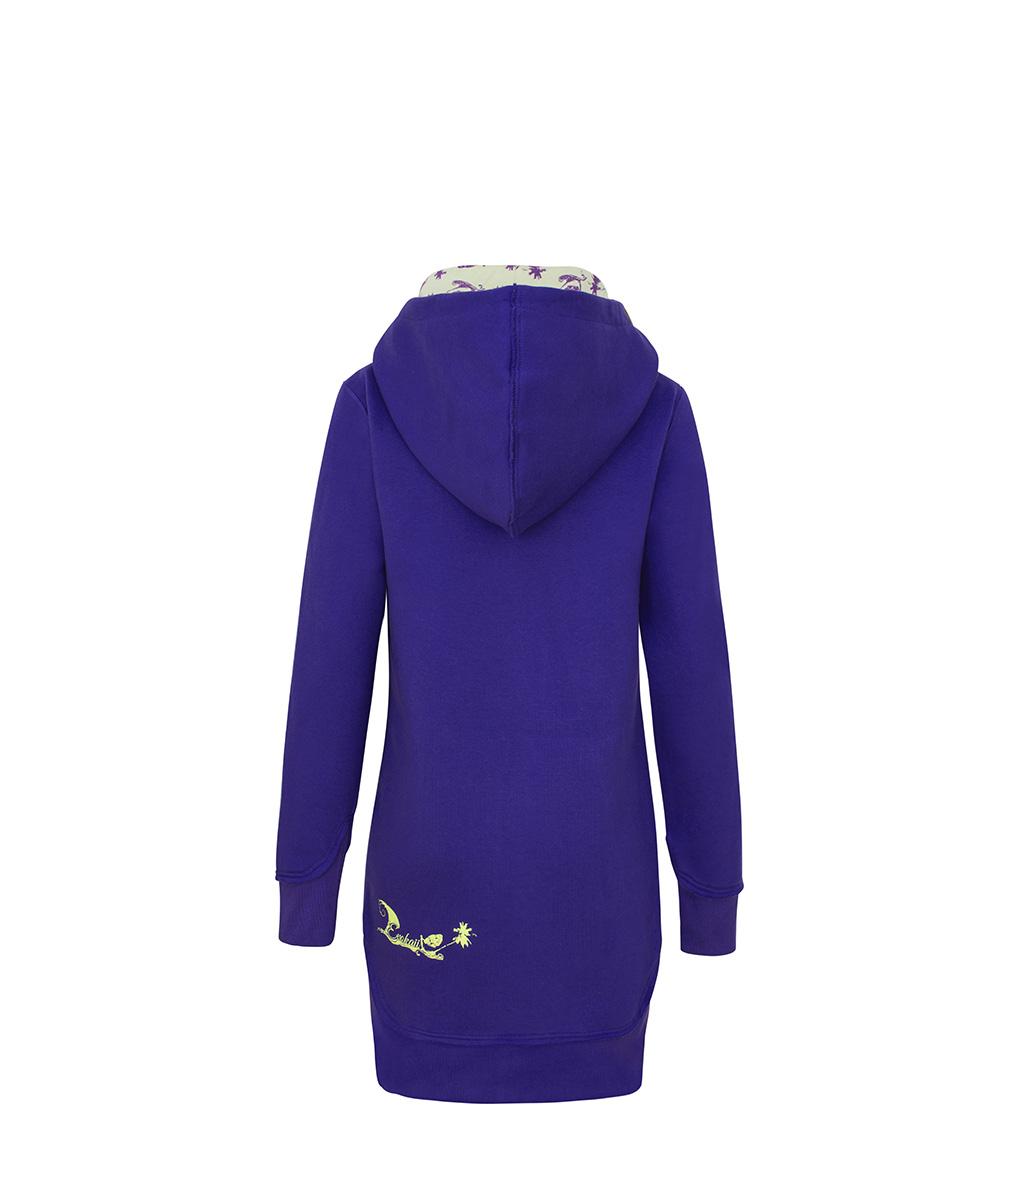 Evokaii Women Surf Style Long Tailed Hoodie - Freestyle Purple Back